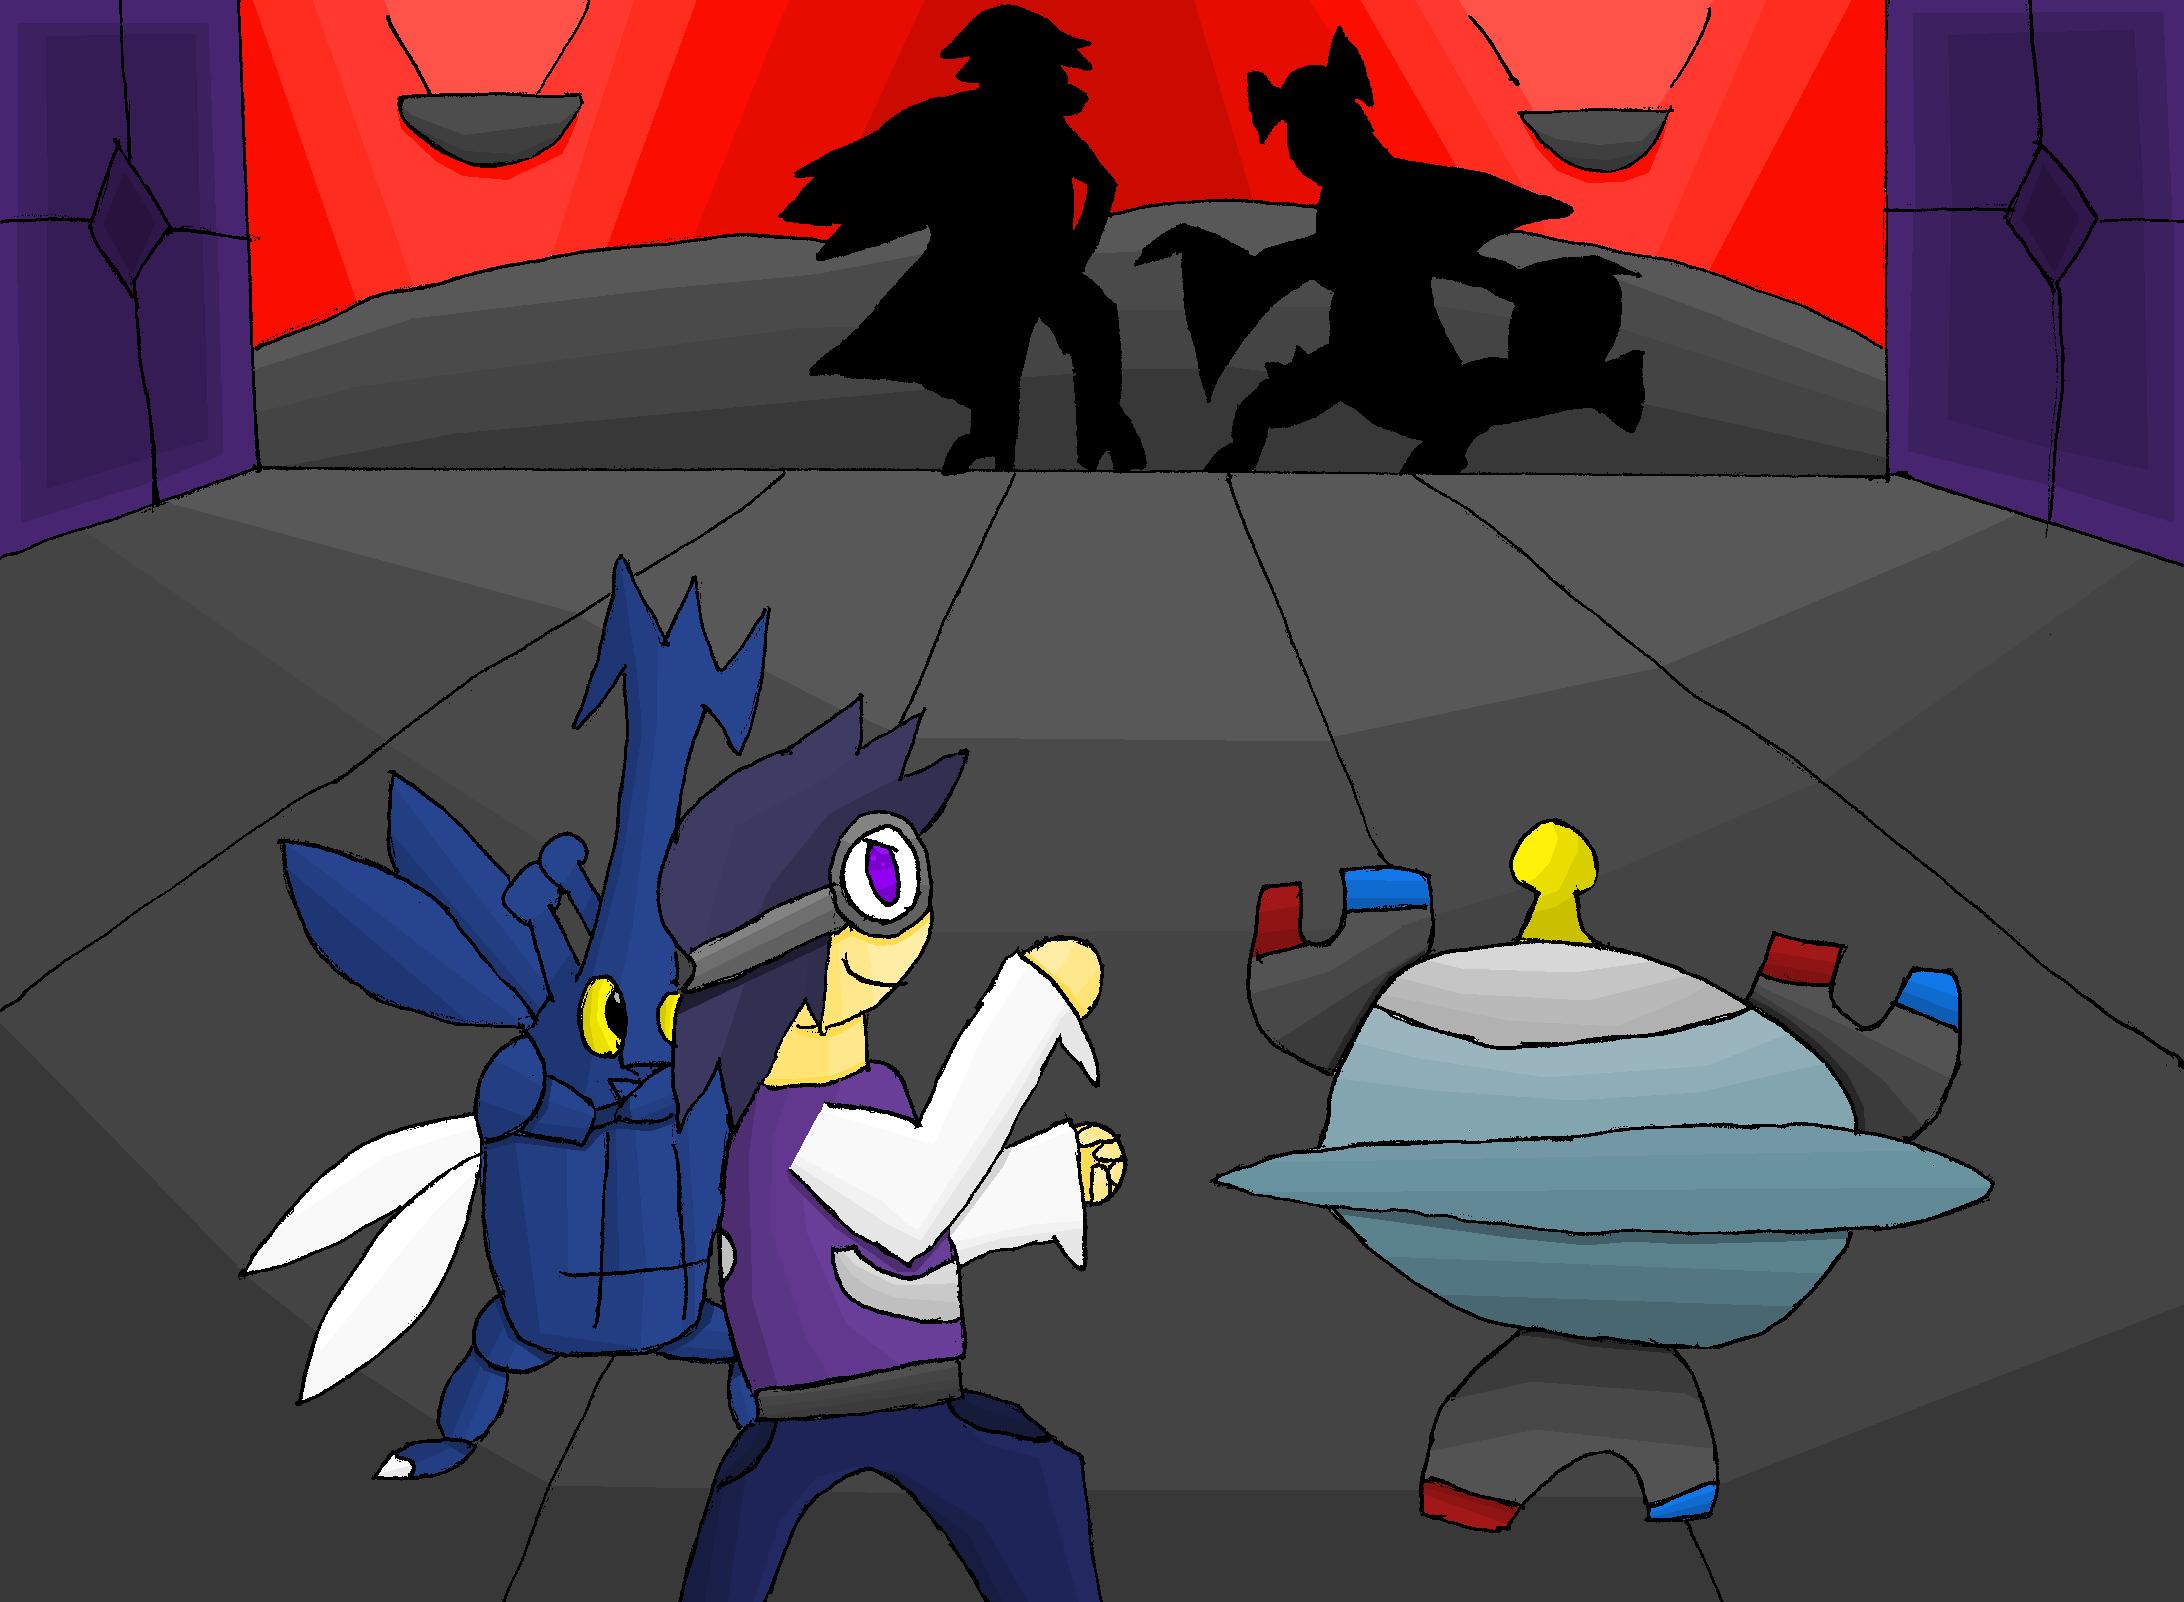 Cobalt vs. Cynthia